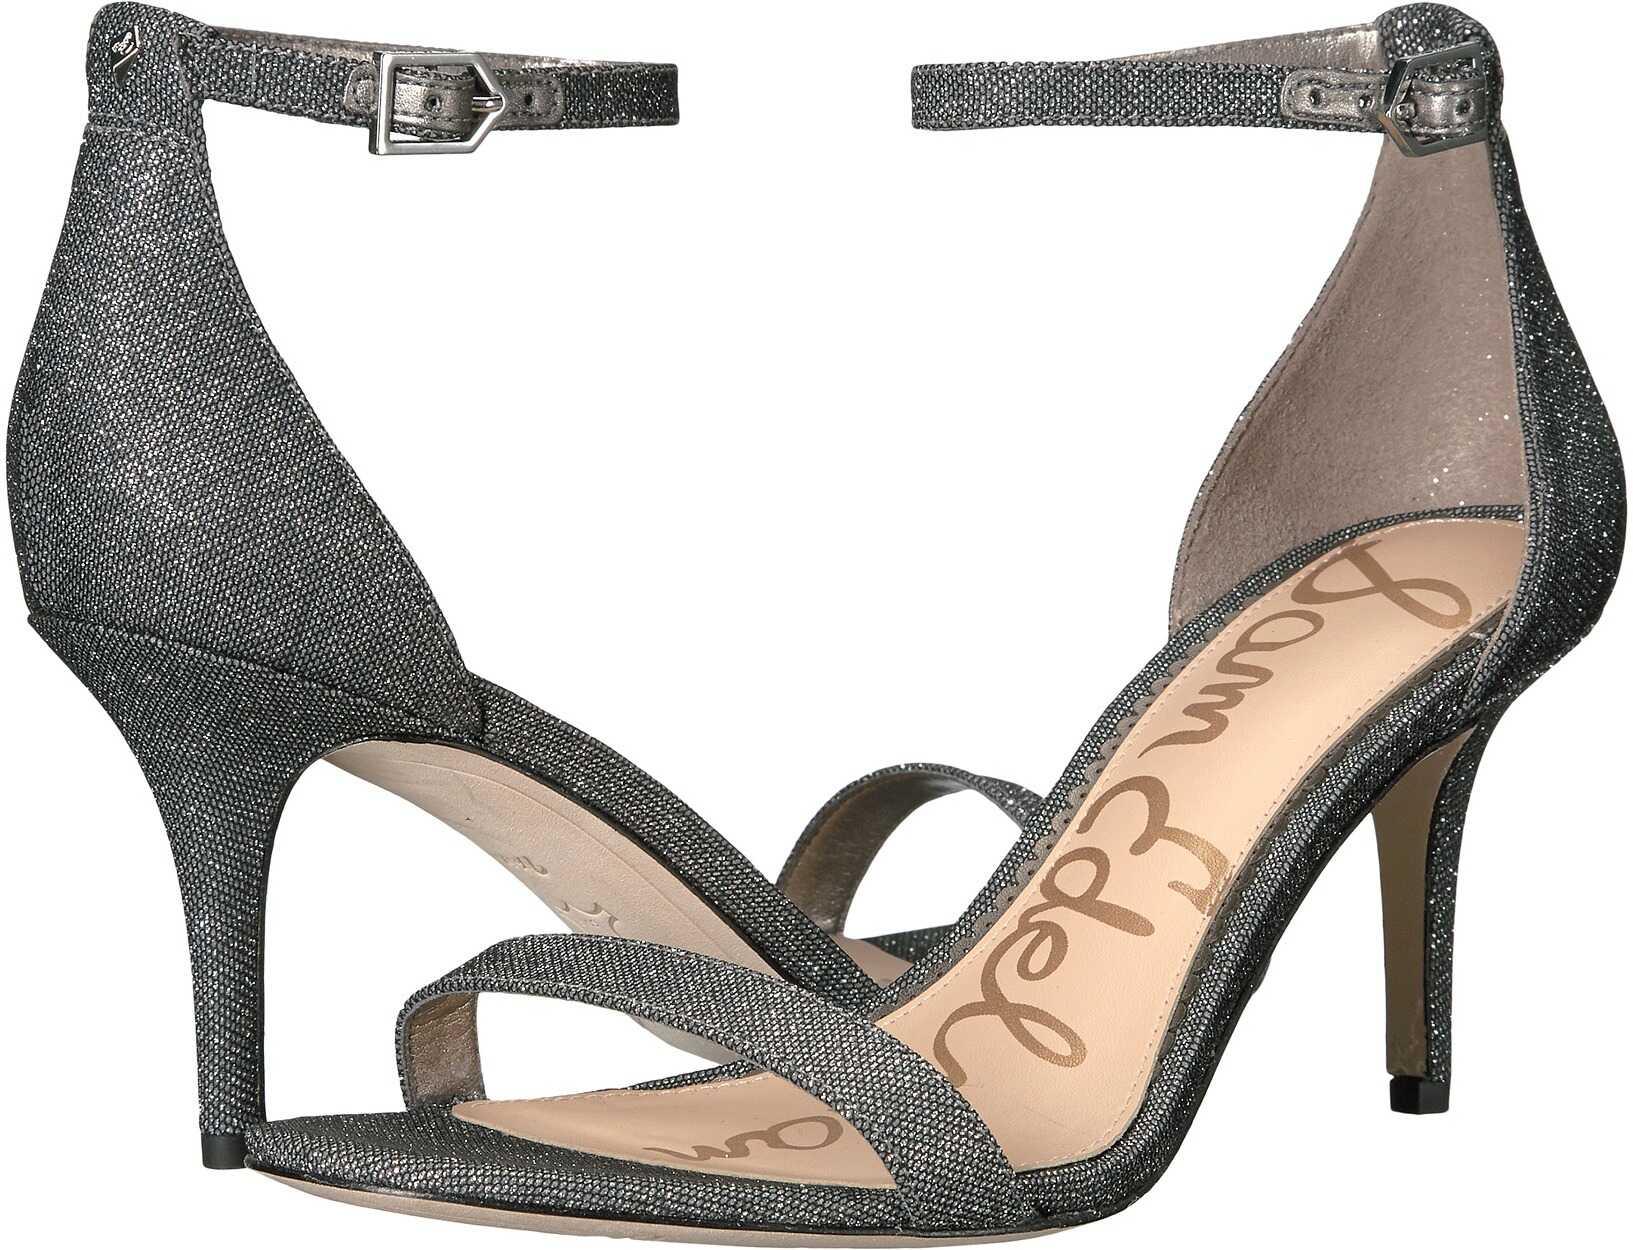 Sam Edelman Patti Strappy Sandal Heel Pewter Glitzy Mesh Fabric